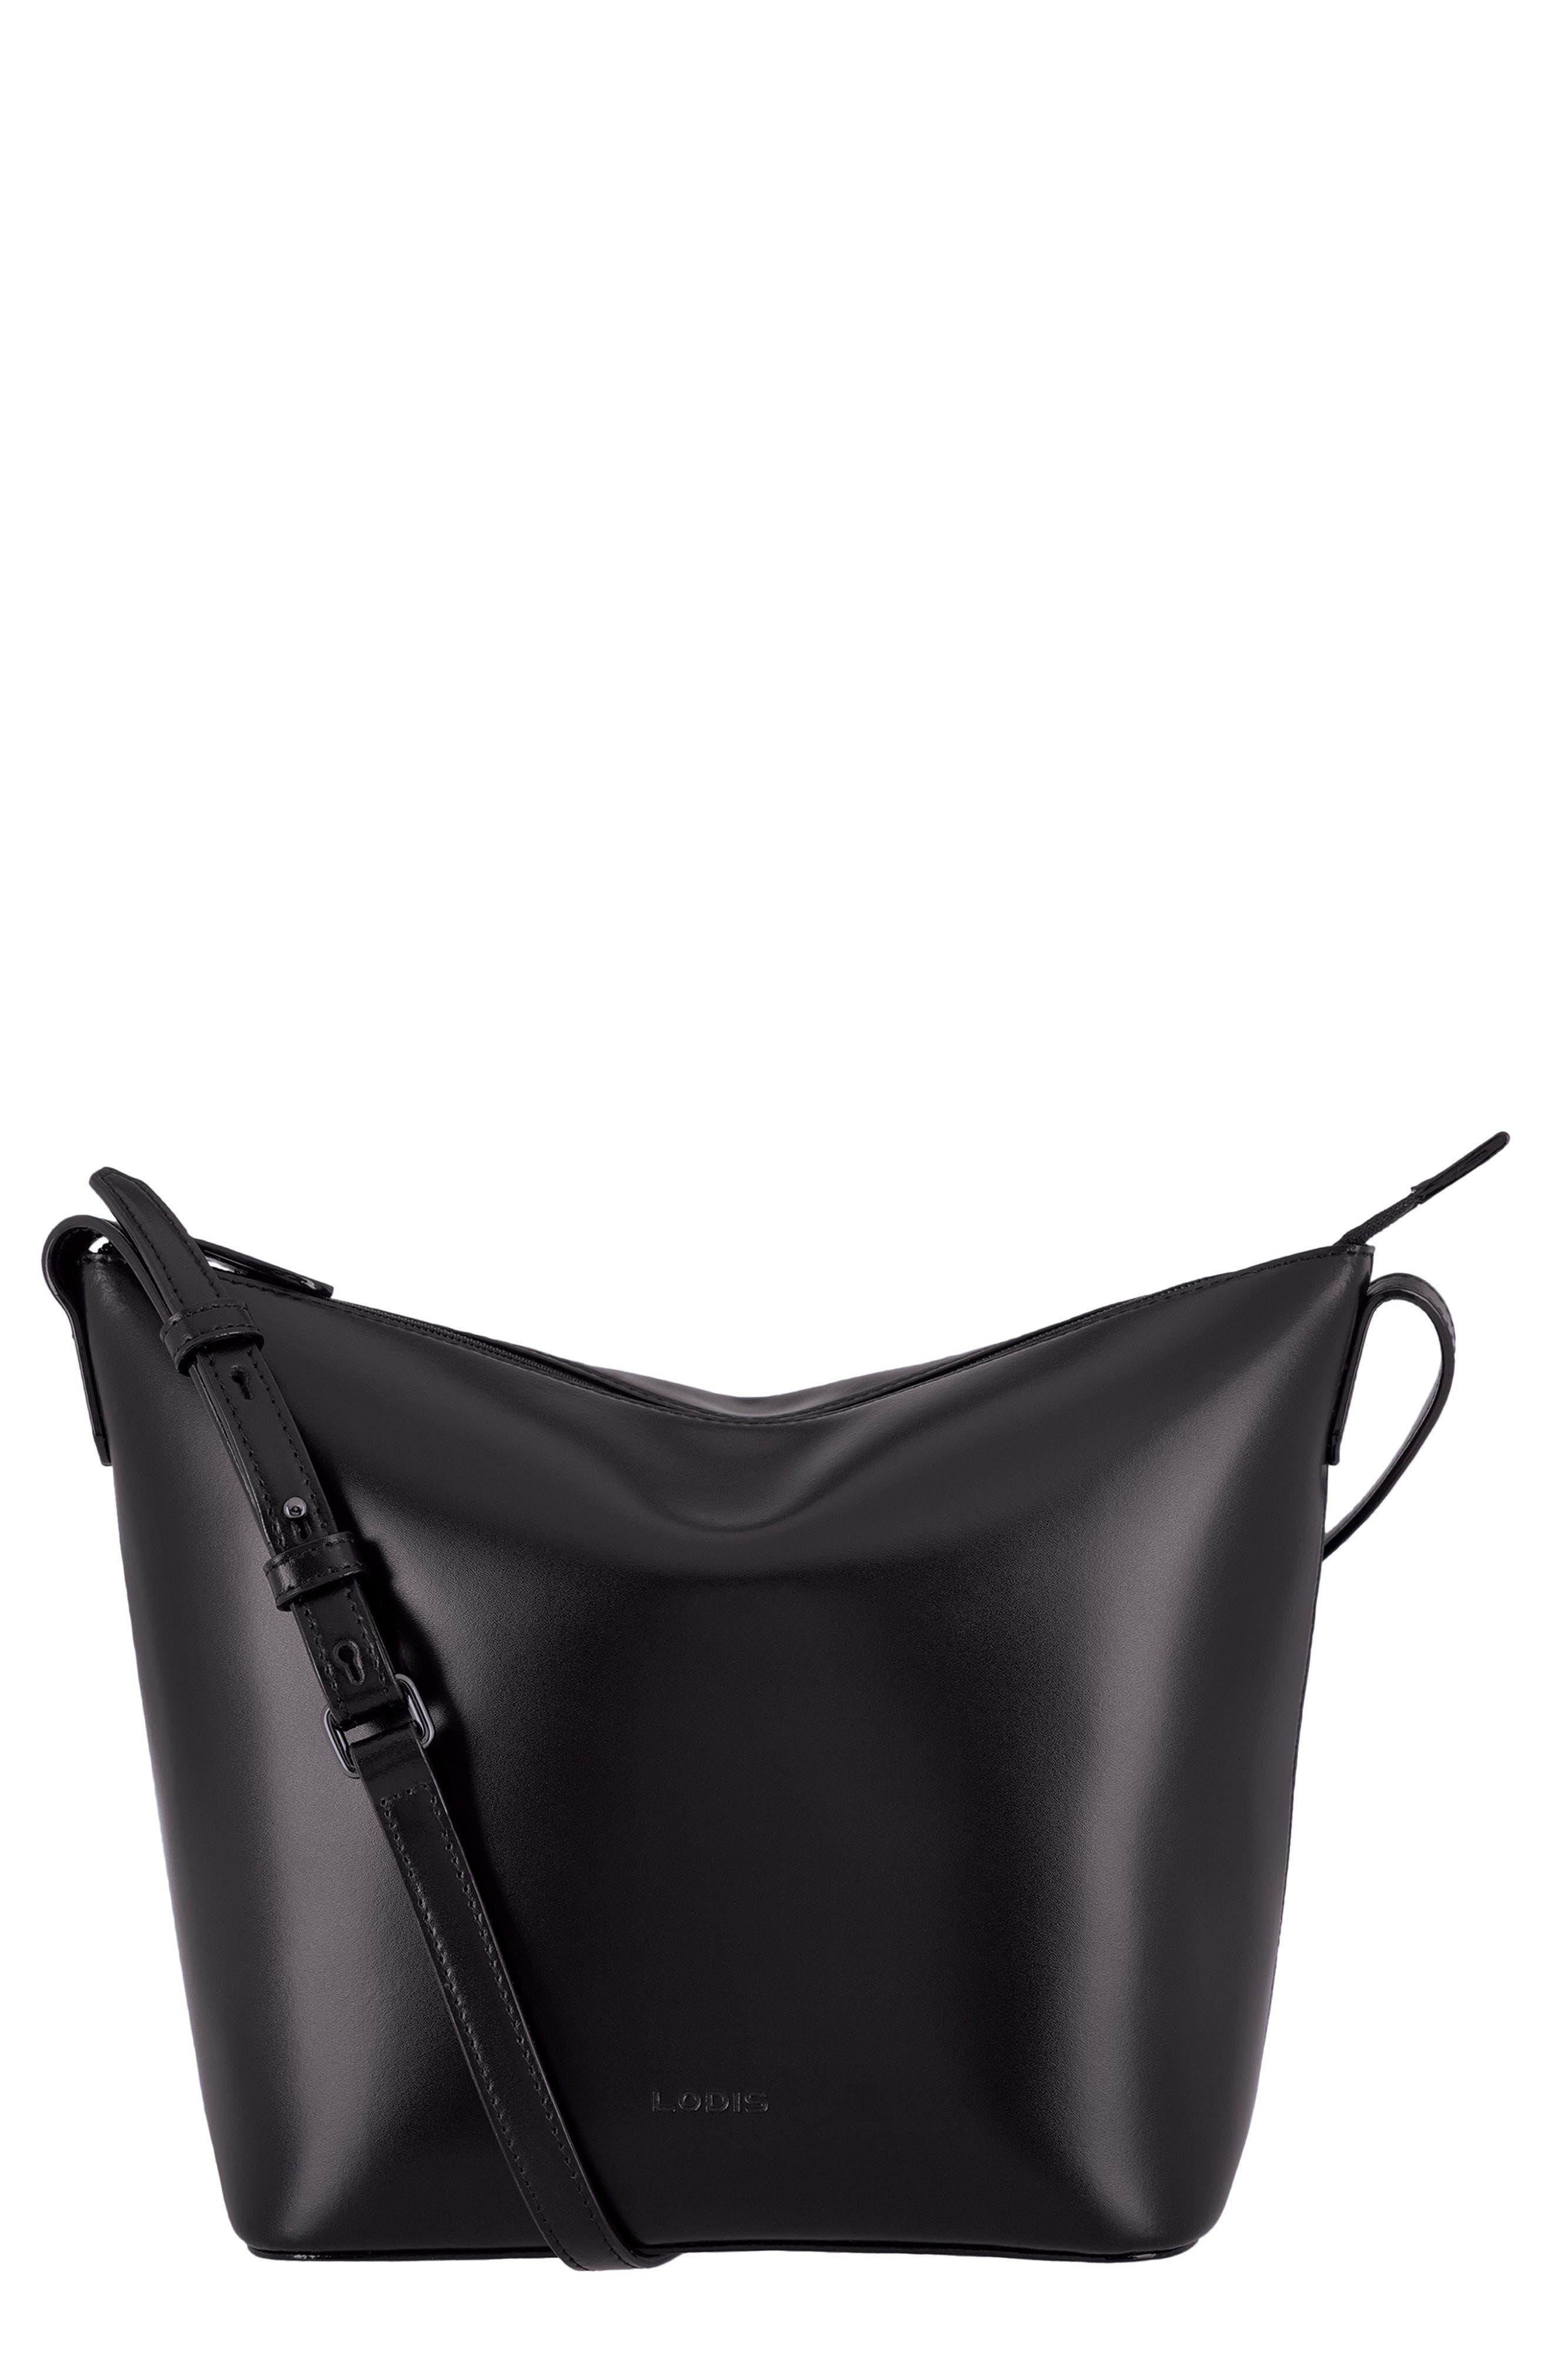 Camilla RFID Leather Crossbody Bucket Bag,                         Main,                         color, BLACK/ BLACK